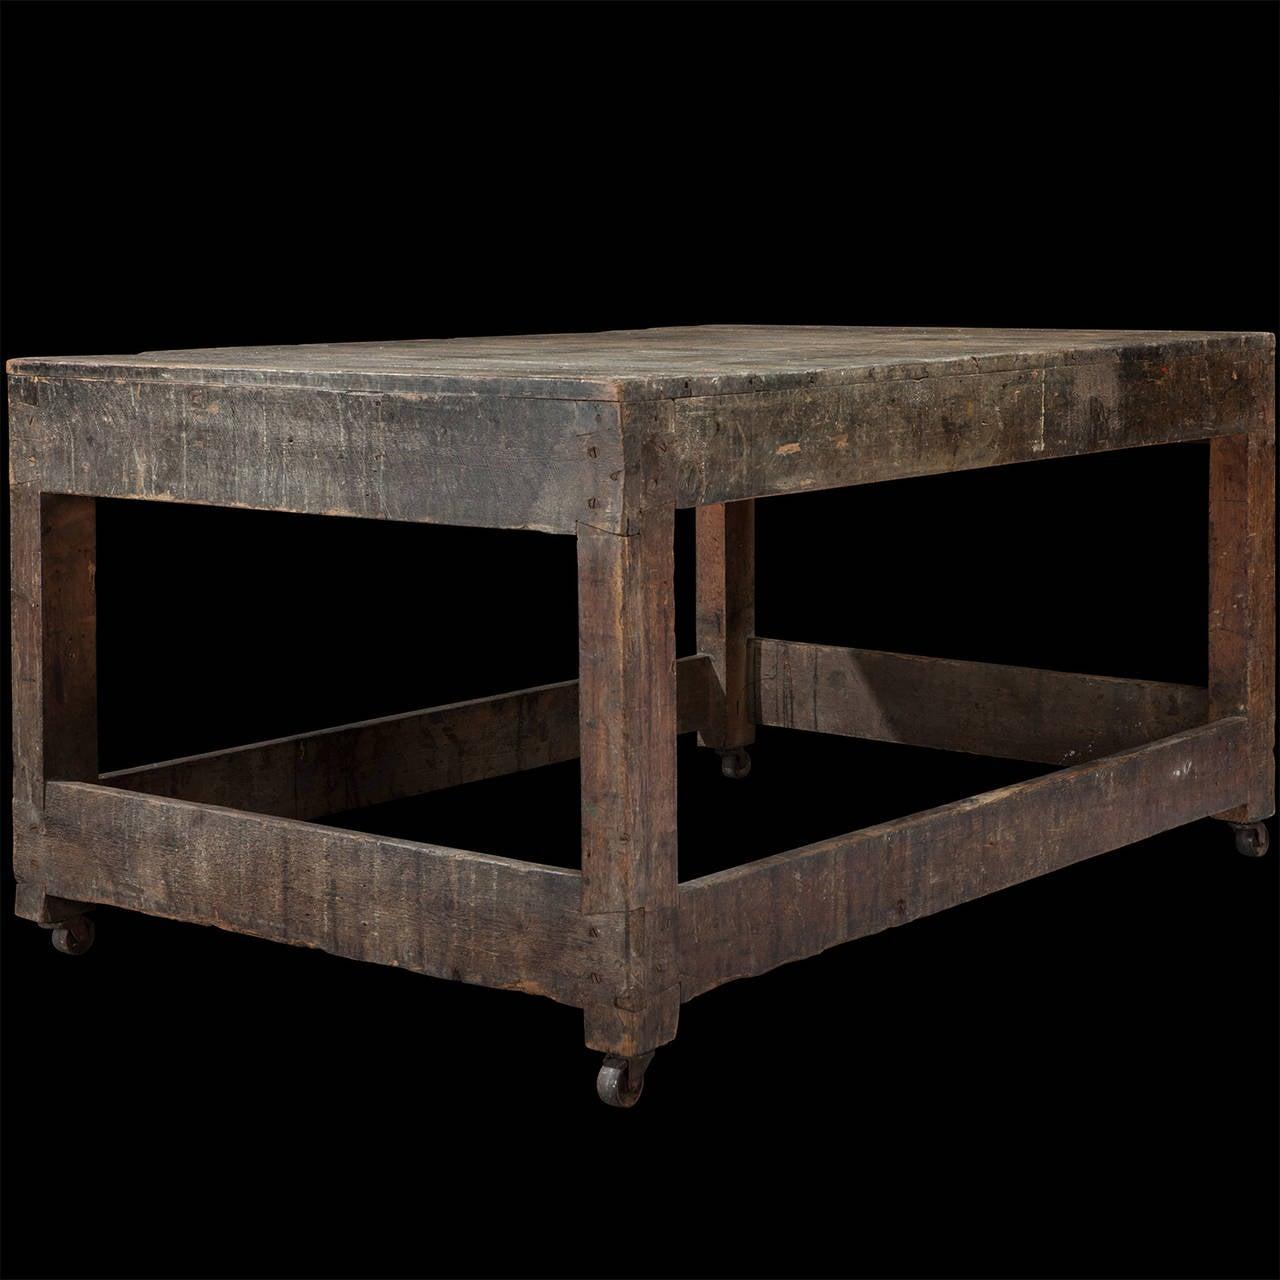 Primitive Side Table at 1stdibs : PRIM2644l from 1stdibs.com size 1280 x 1280 jpeg 120kB